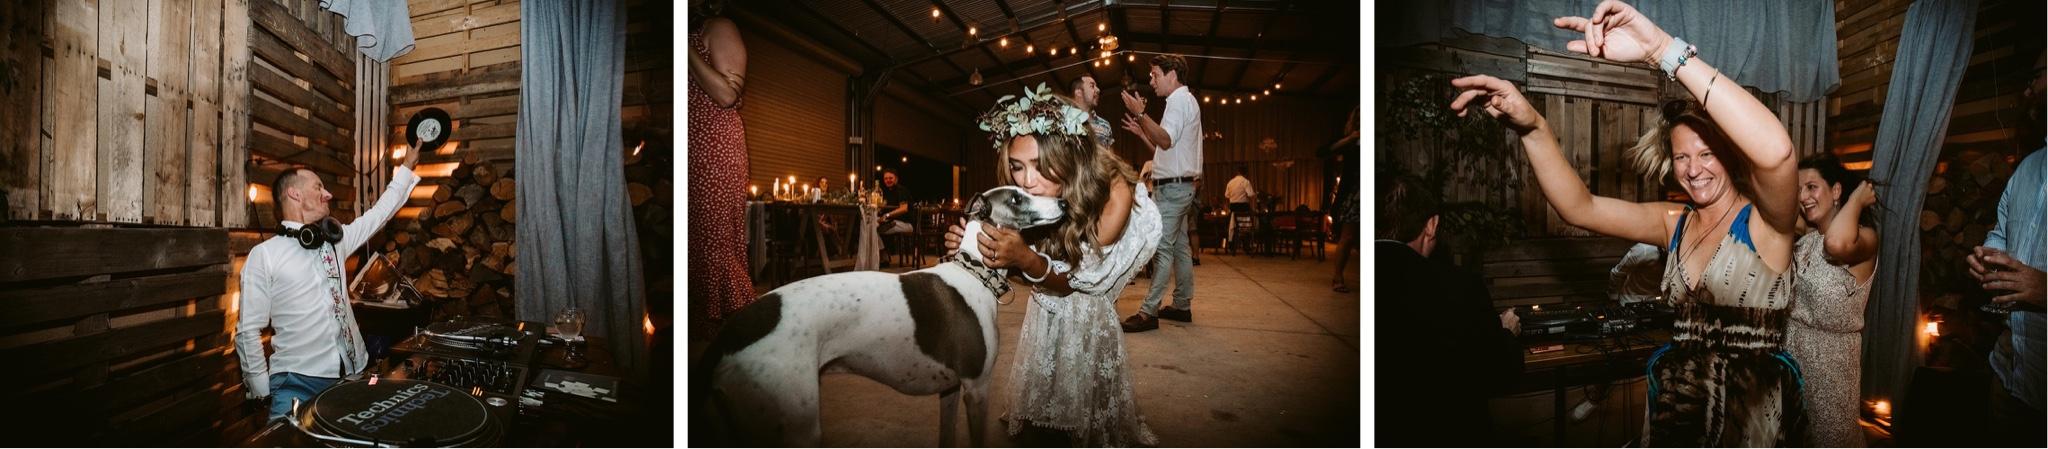 Wedstival Festival Wedding Photographer Yarra Valley162.jpg